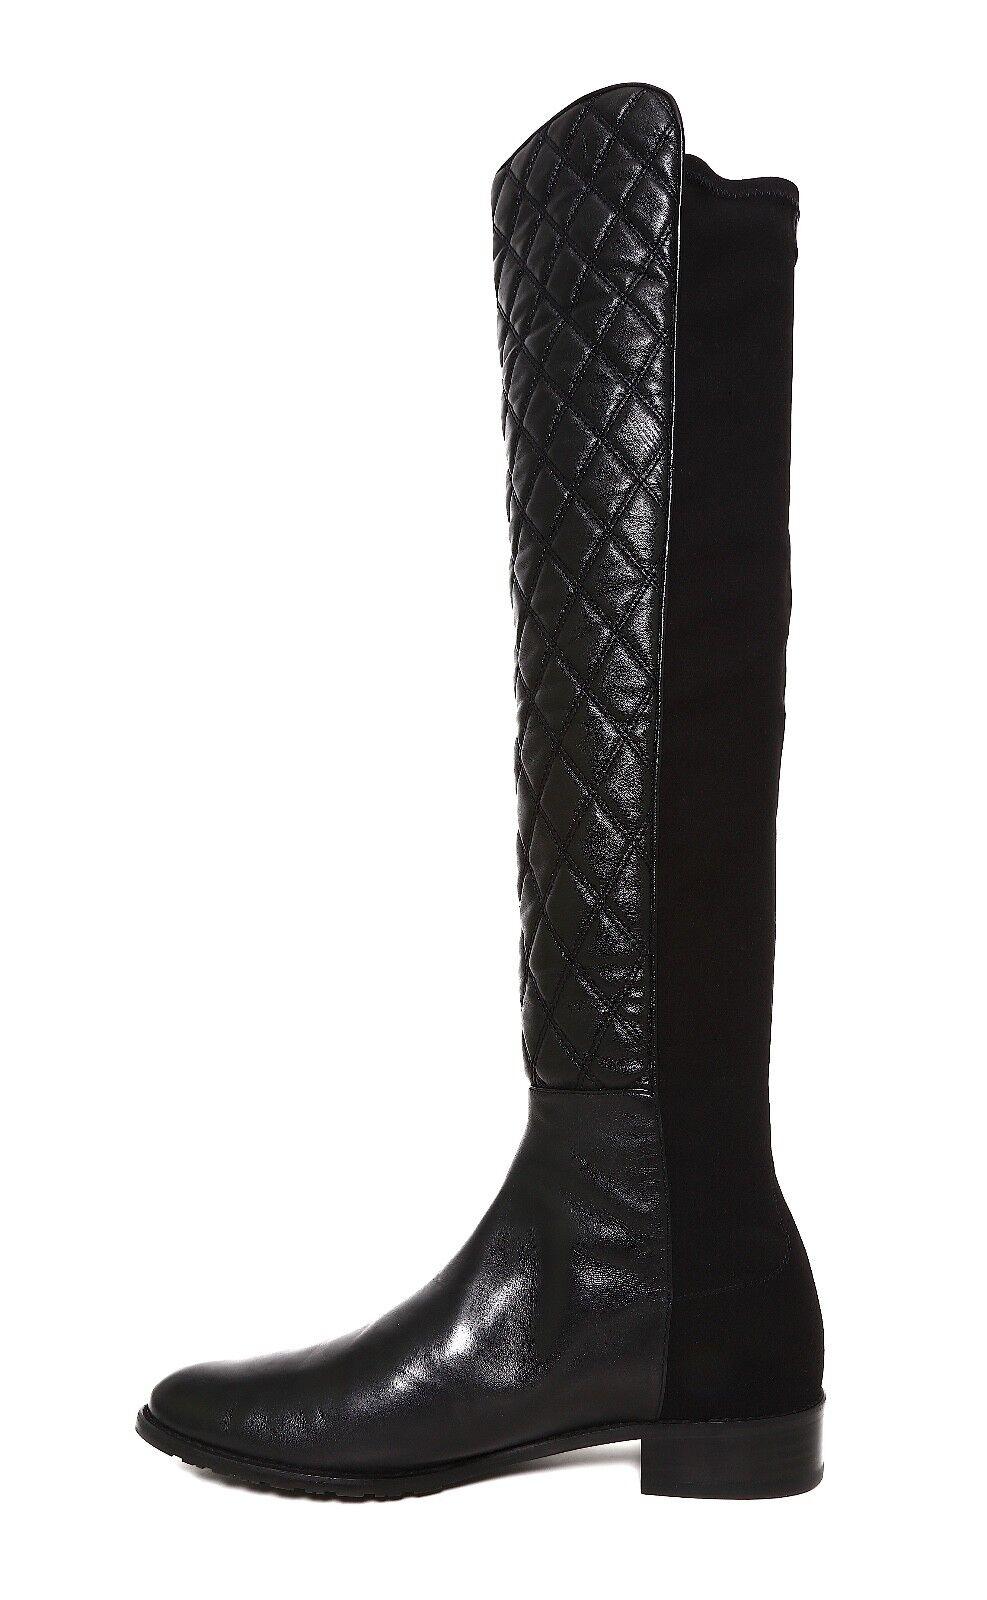 Stuart Weitzman Quiltboot Knee Leather Leather Leather Boot Black Women Sz 8.5 M 5647  f77f6c